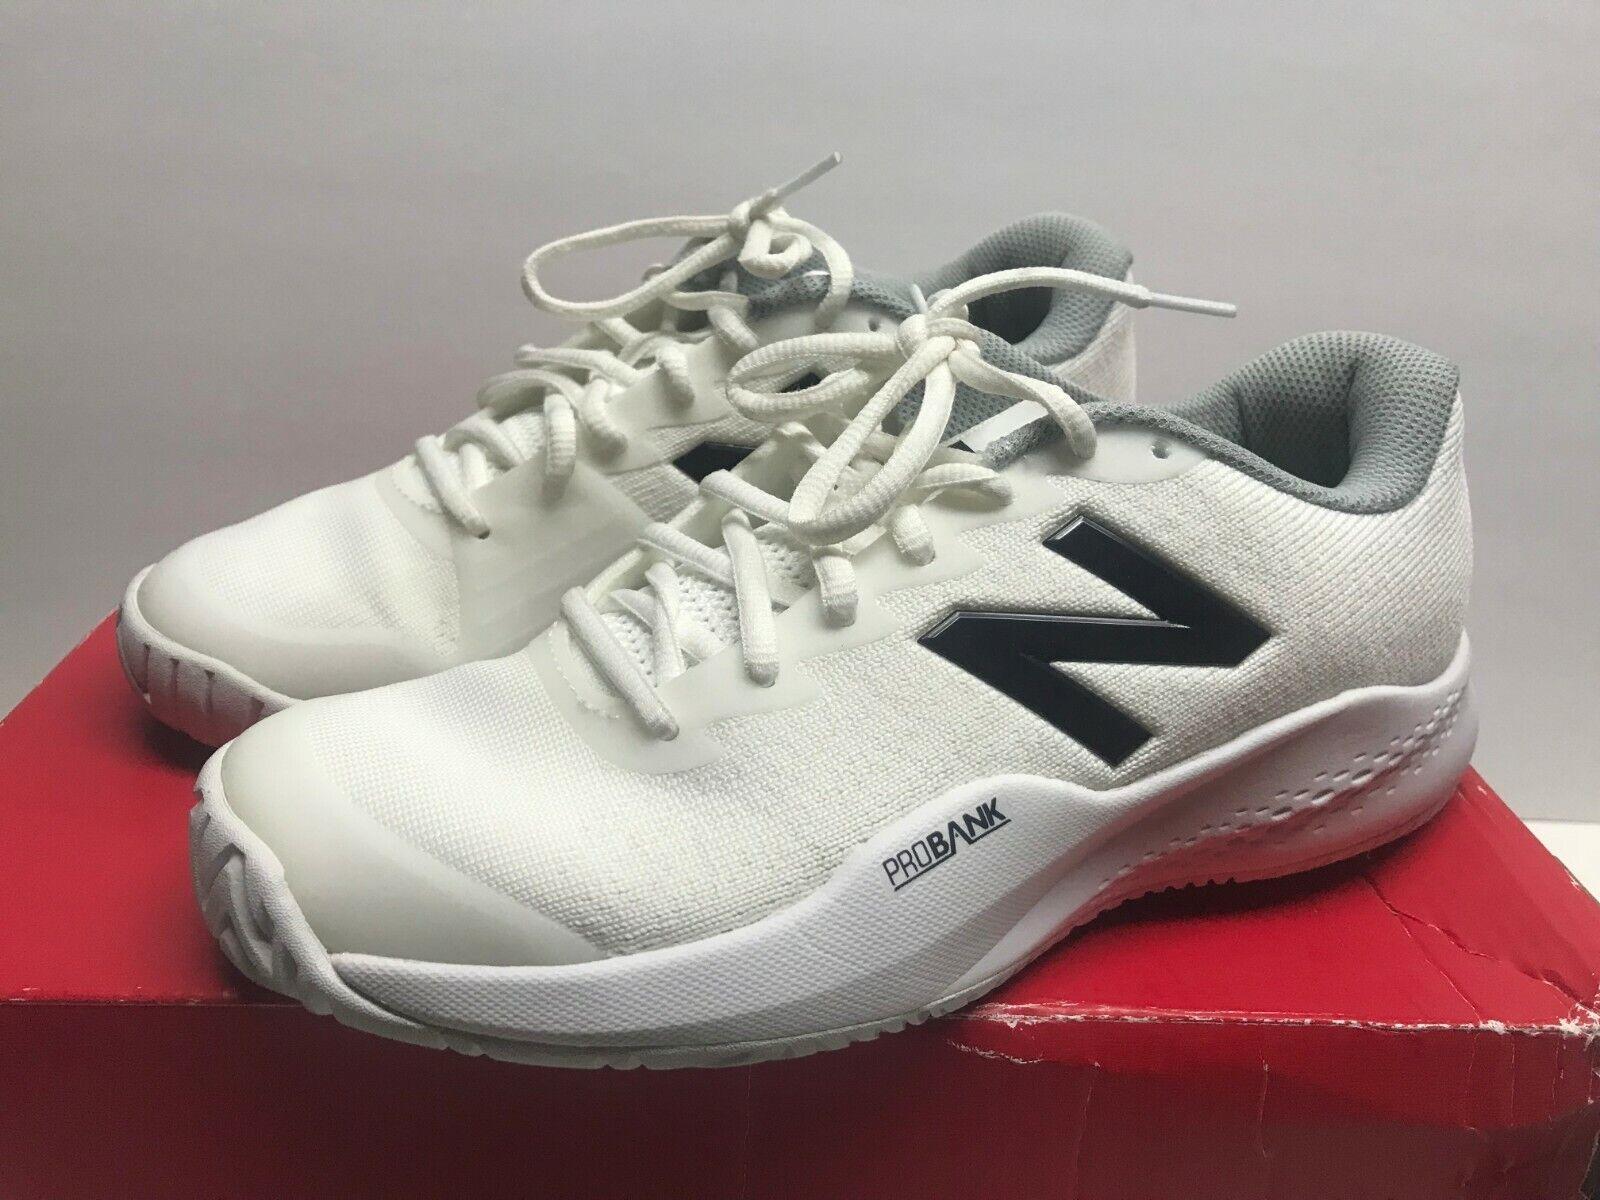 New Balance de mujer 7 996 v3 Hard Court Zapato De Tenis blancoo